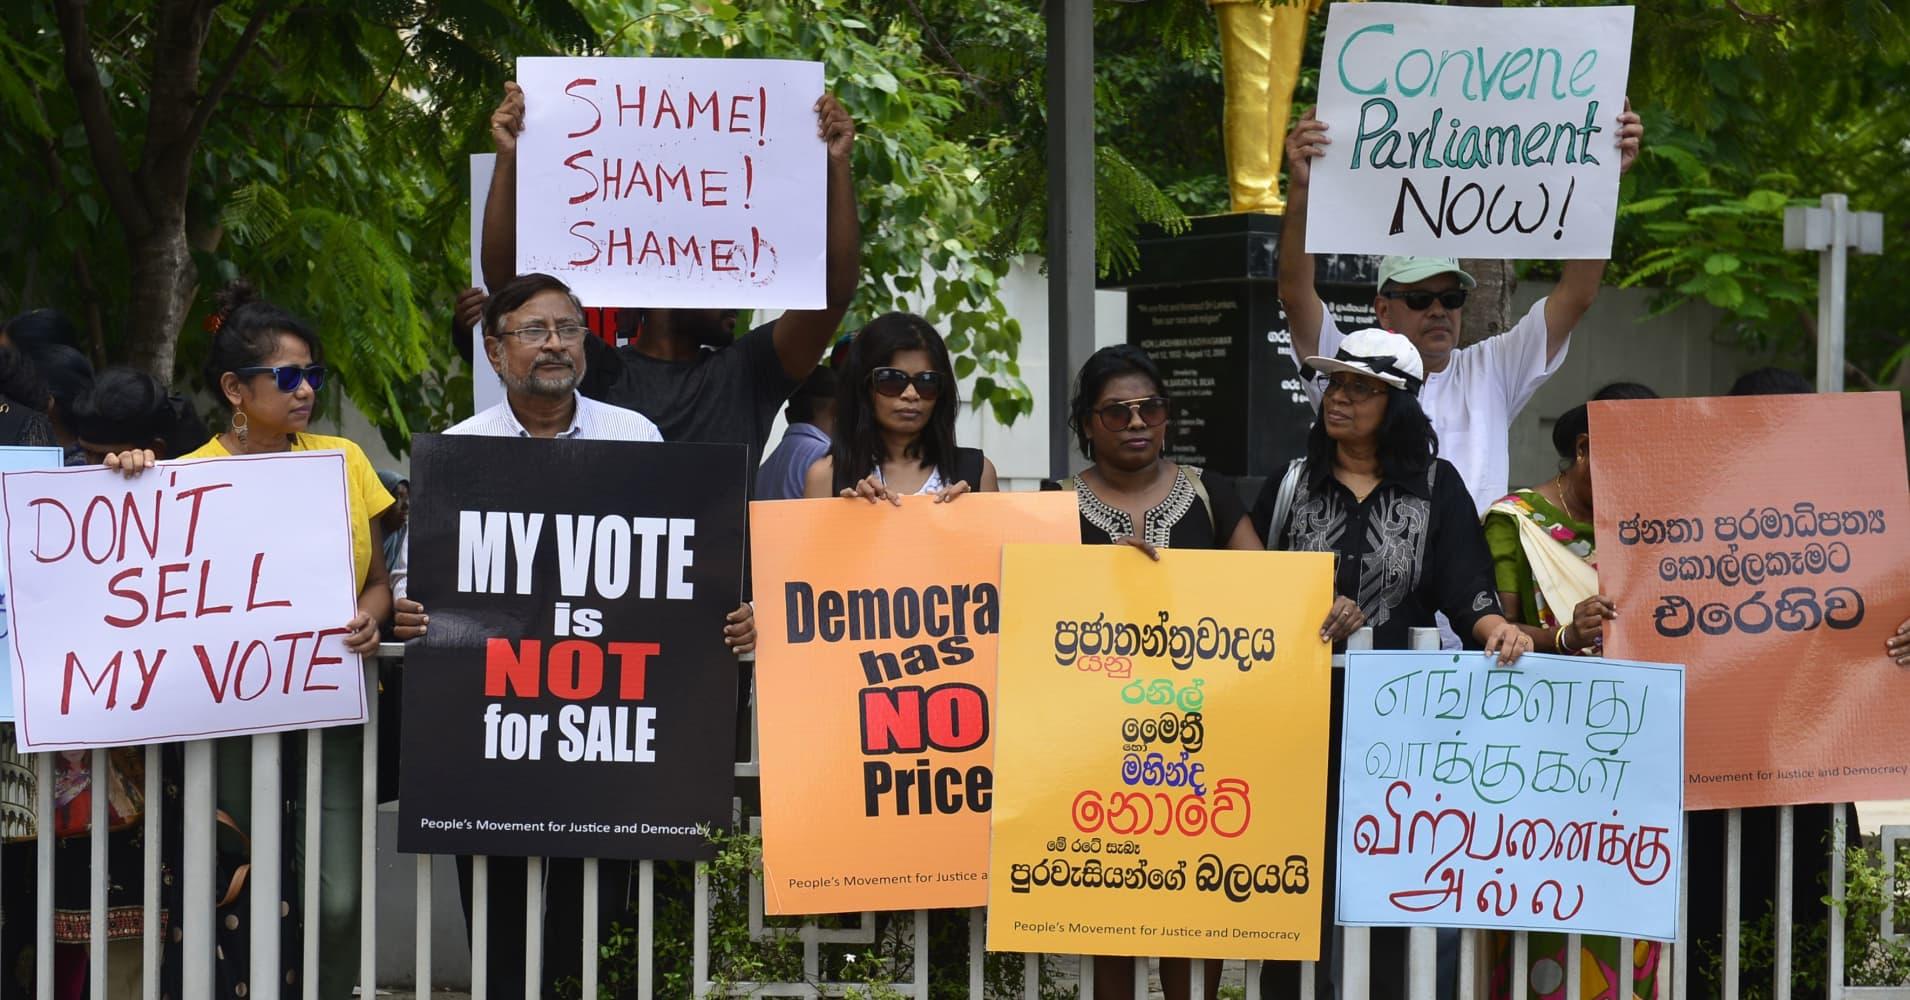 Political turmoil could test Sri Lanka's ties with international community